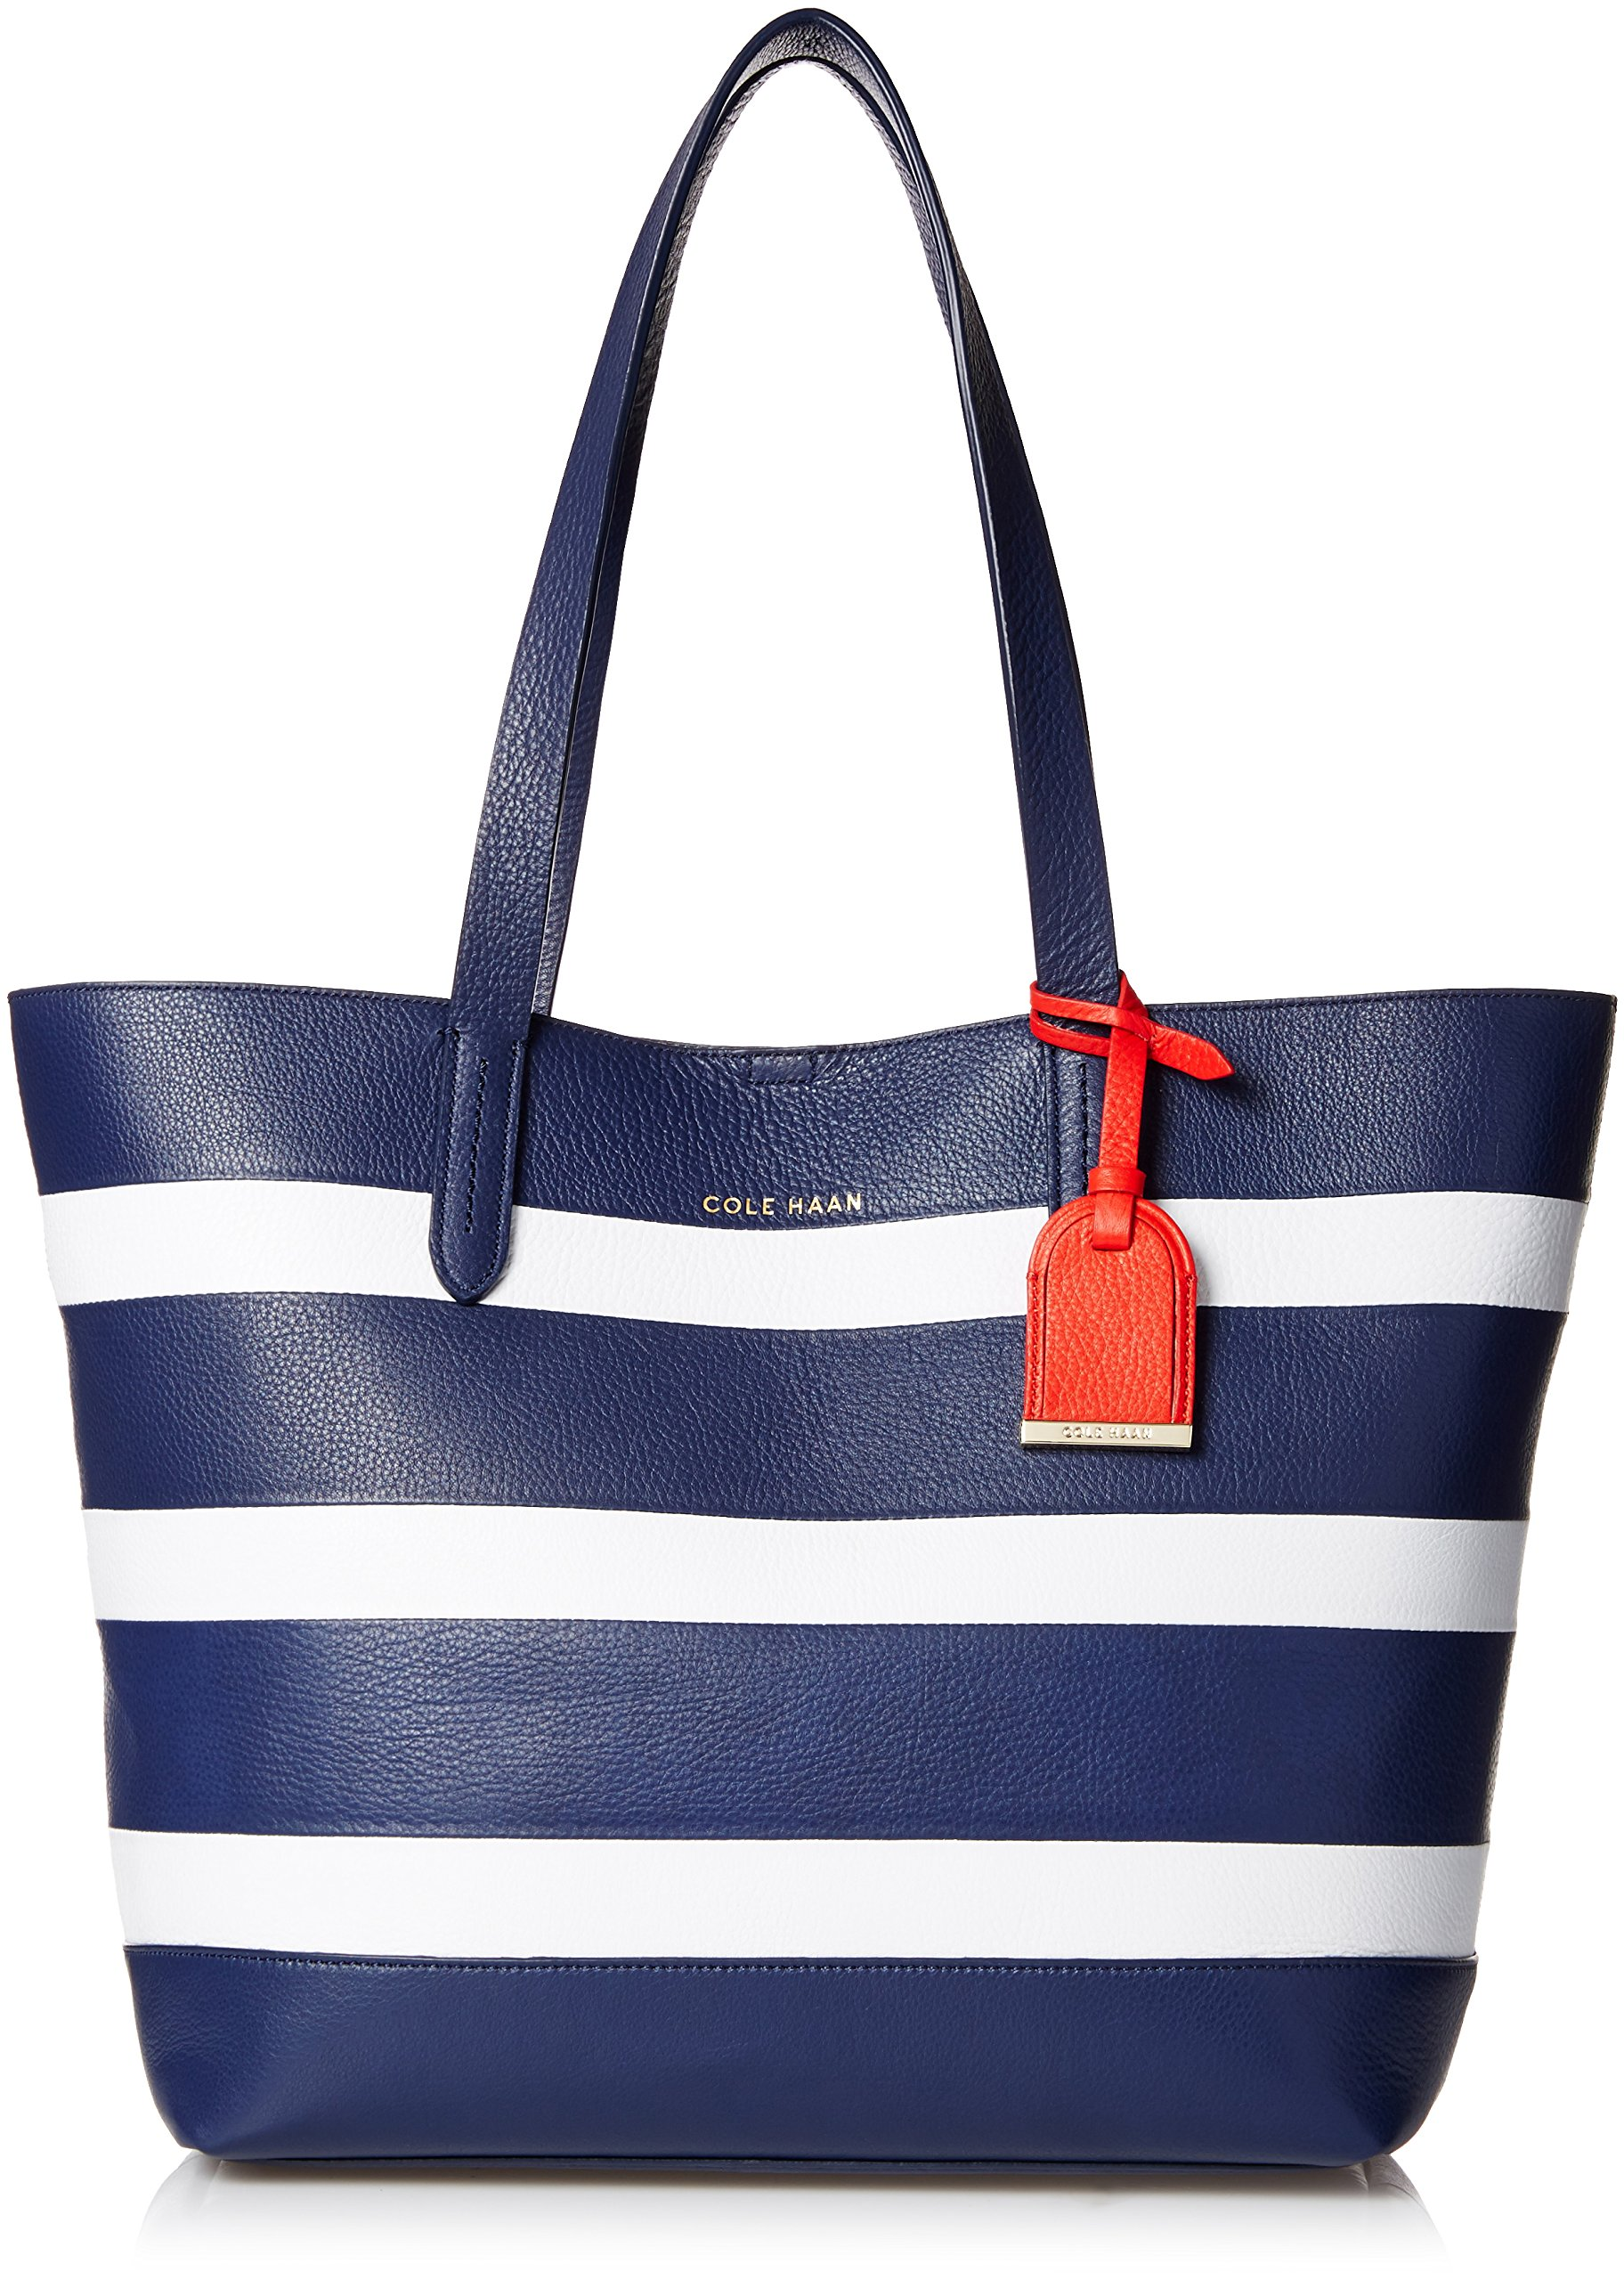 Cole Haan Palermo Small Travel Tote, Blazer Blue/Optic White Stripe, One Size